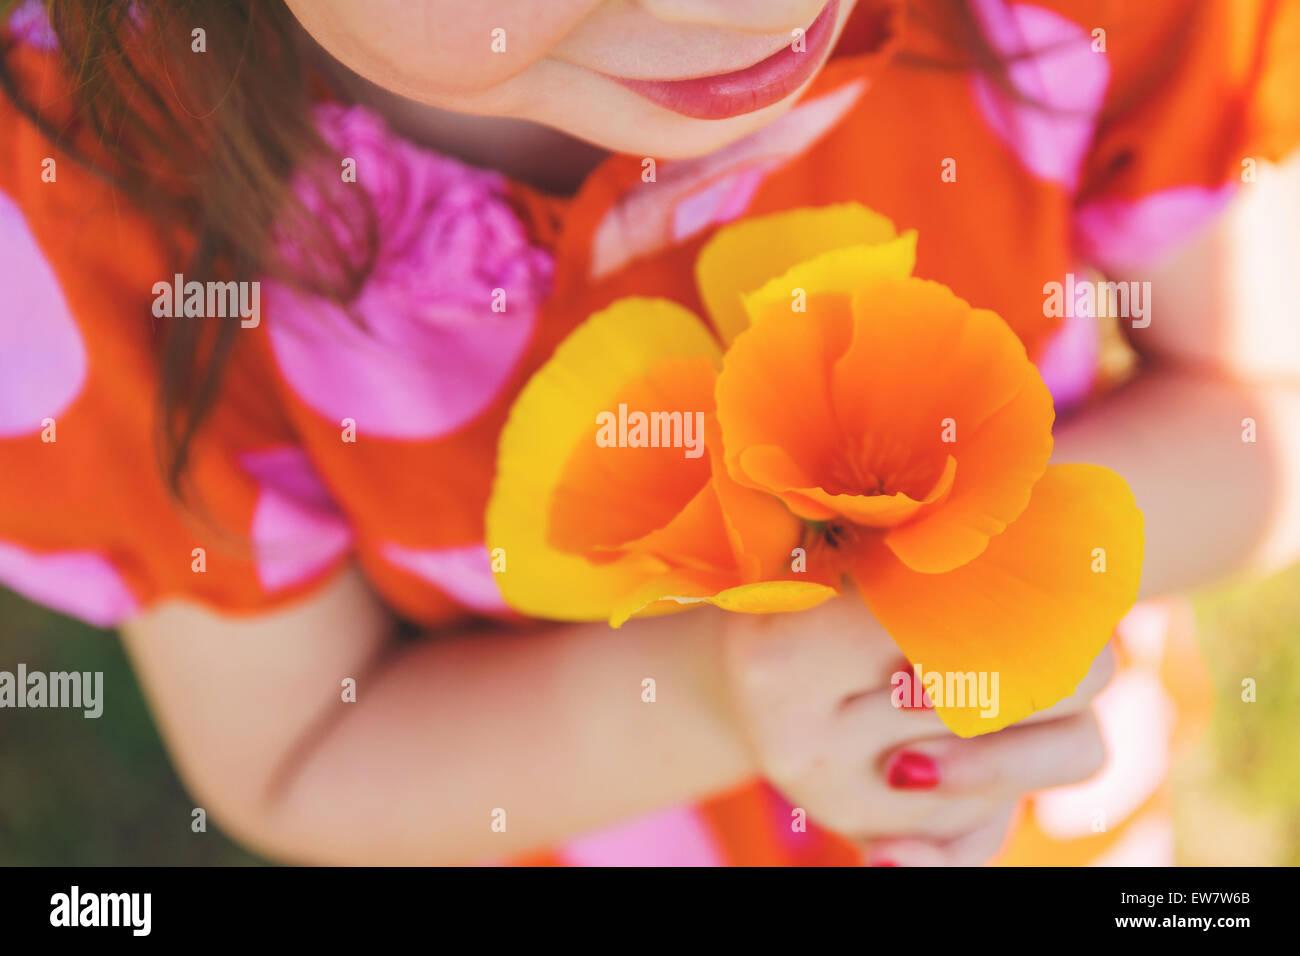 Close-up of a girl holding orange flowers - Stock Image